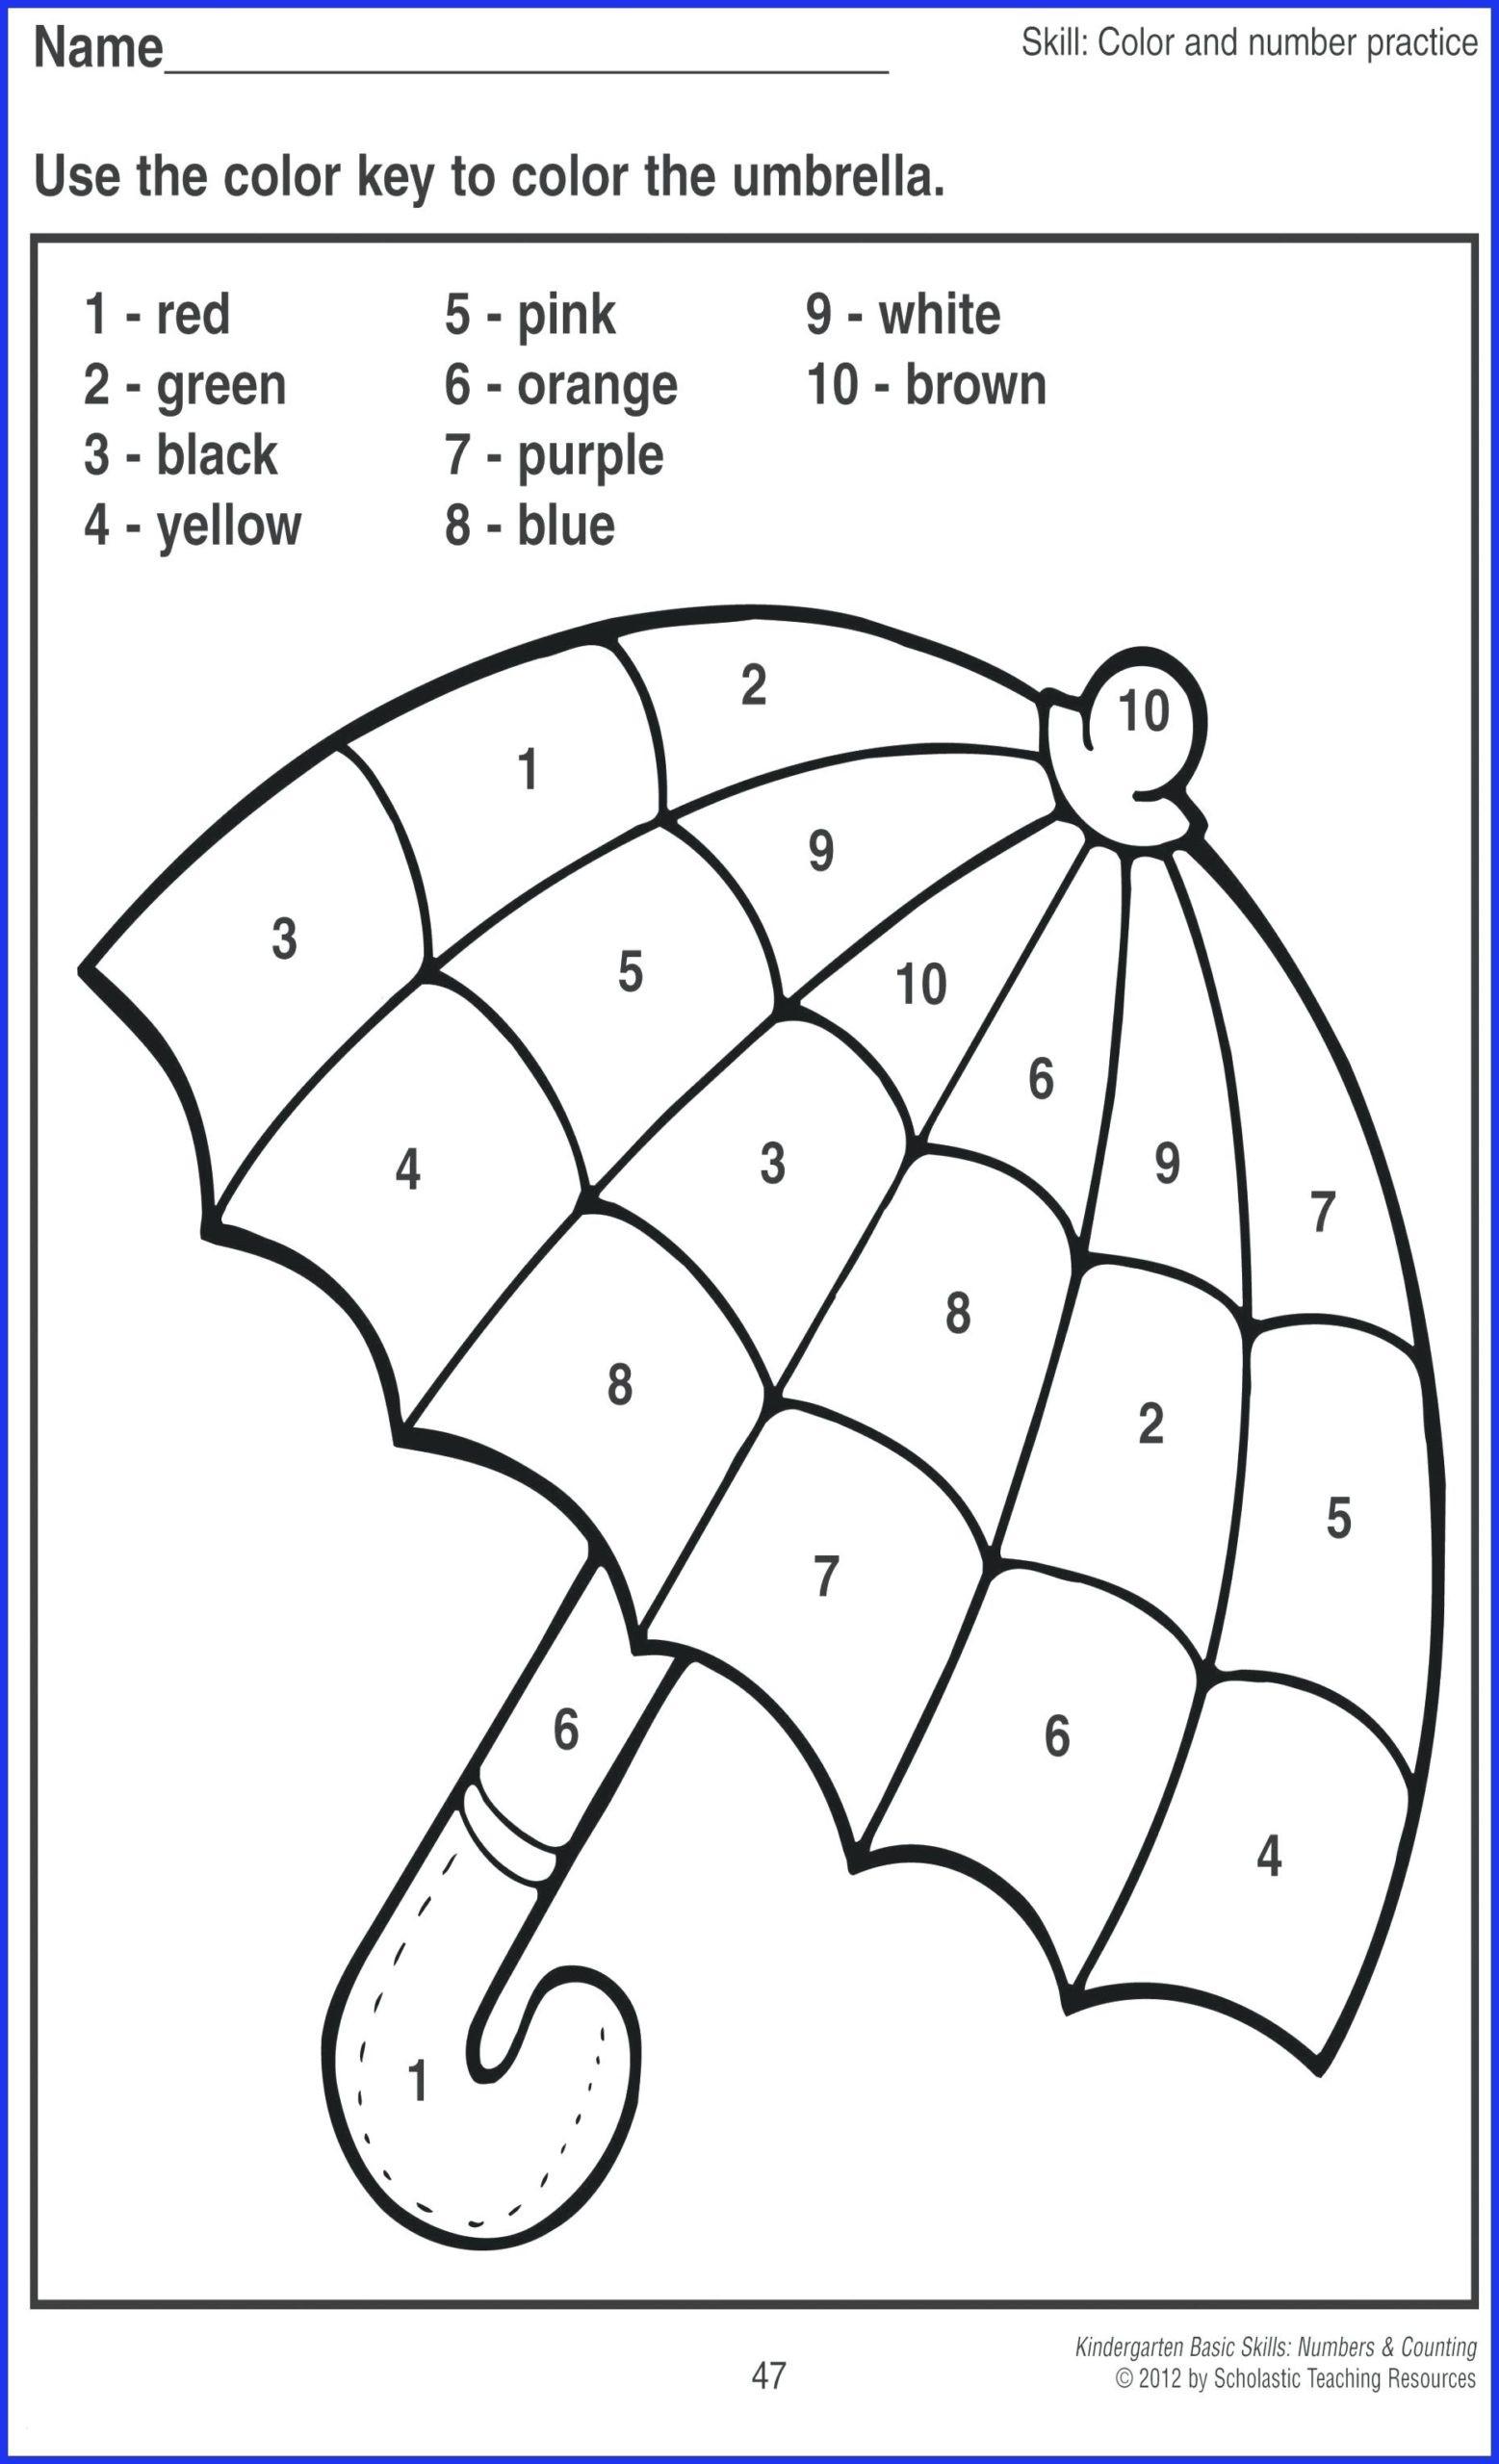 Sign Language Printable Worksheets Worksheet Starfall Sign Language Phonics Learning Games